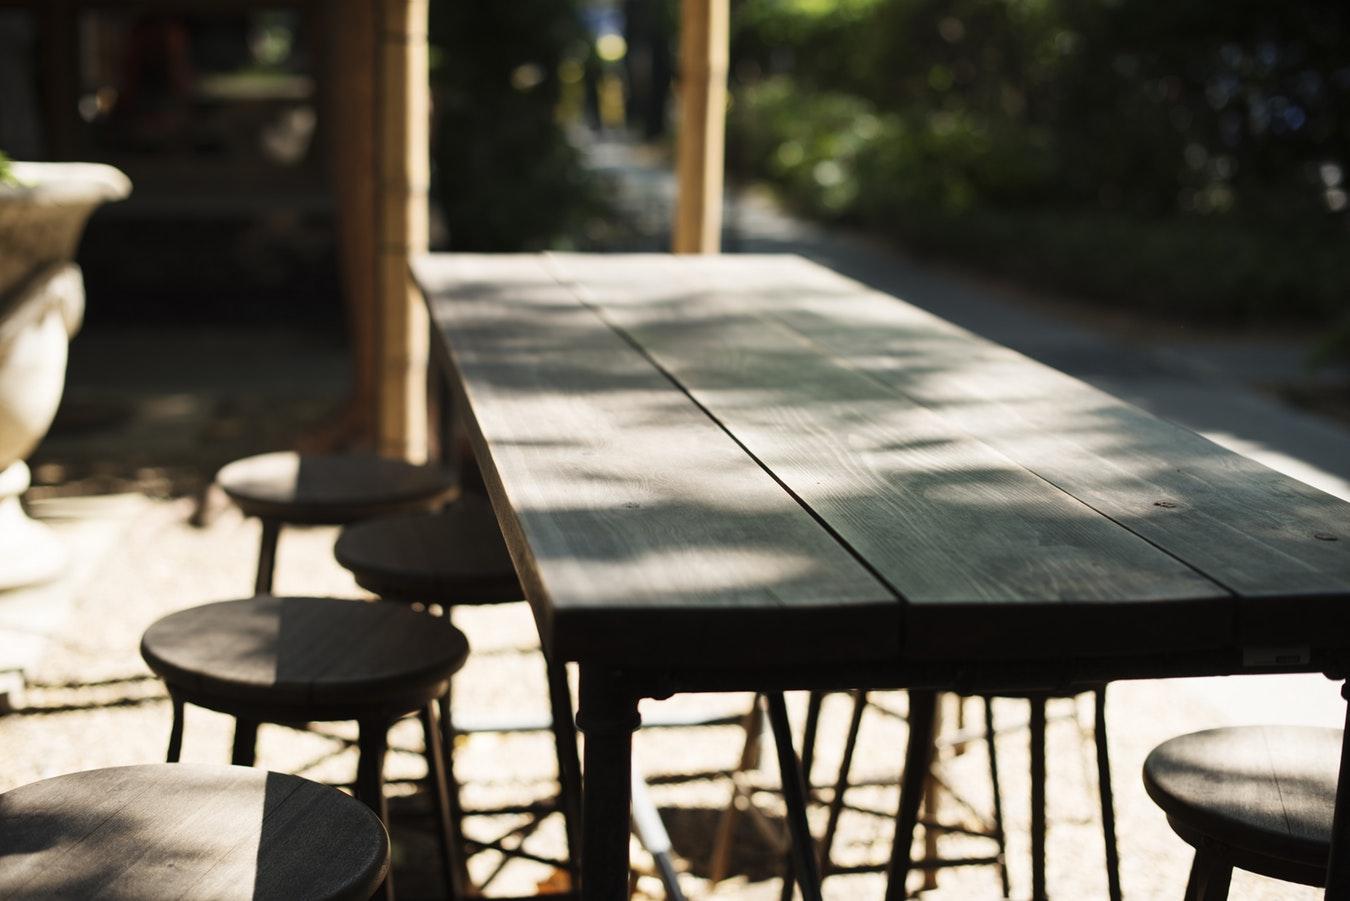 Ikea Padova Tavoli Da Giardino.Tavolo Da Giardino A Bassano Del Grappa Favaro Arreda